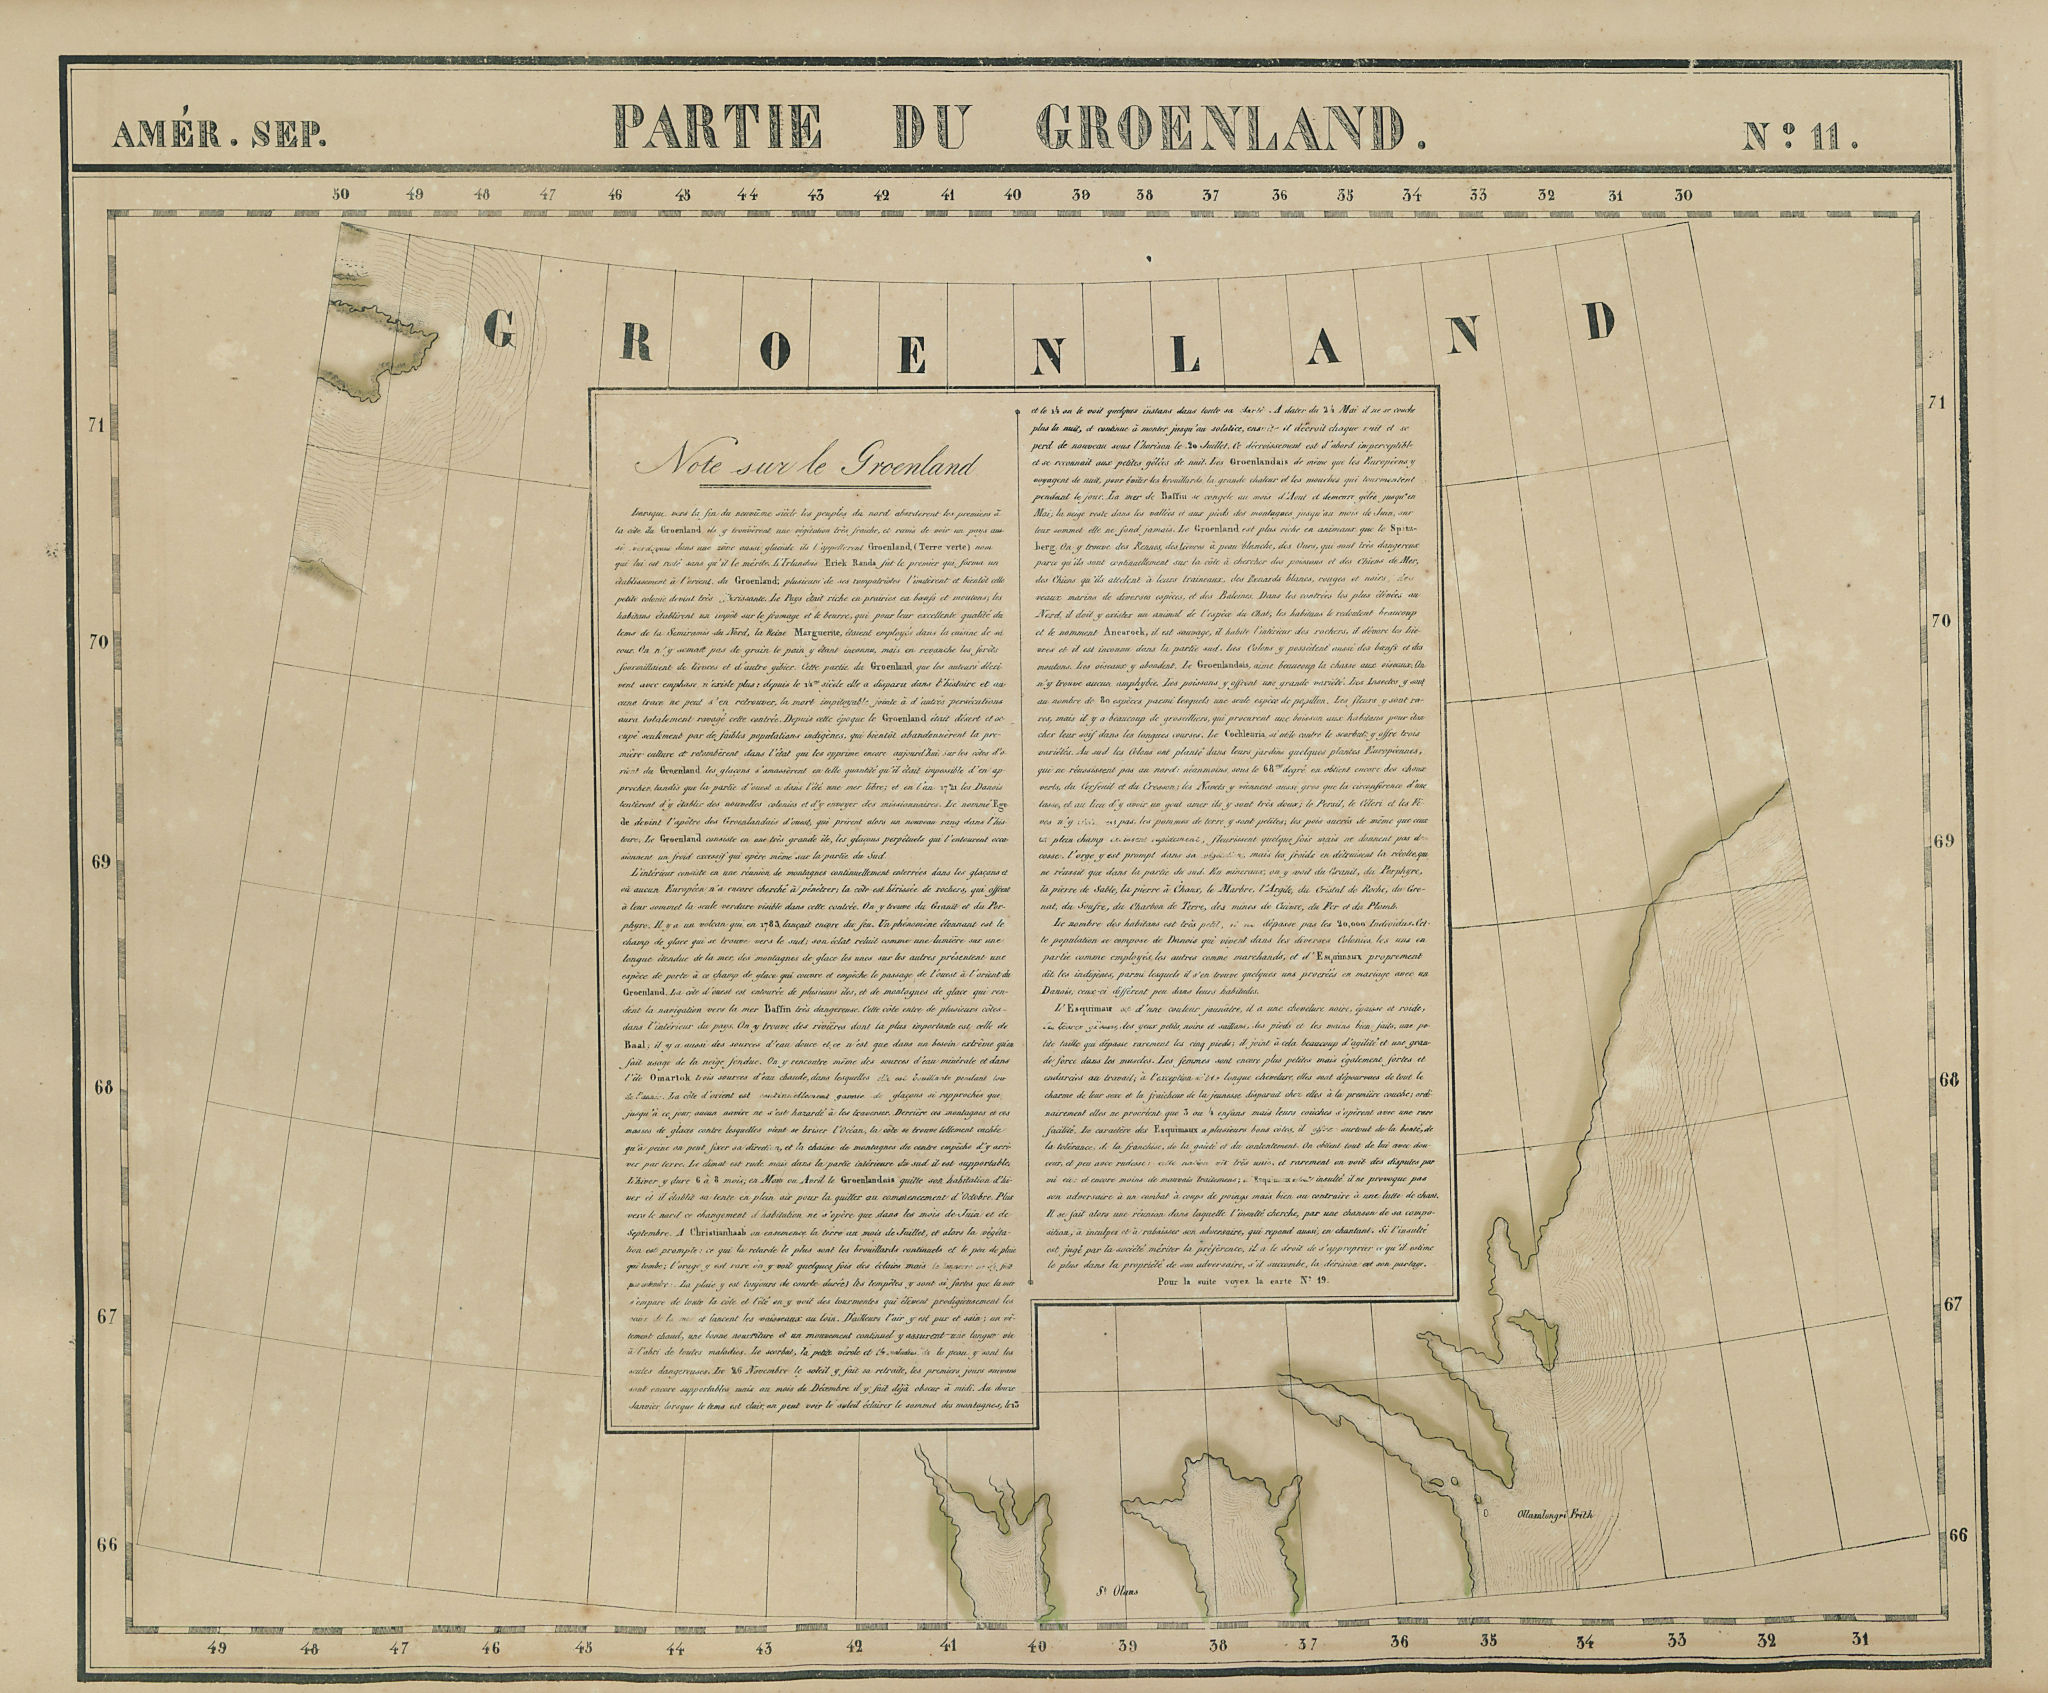 Amér. Sep. Partie du Groenland #11. Central Greenland. VANDERMAELEN 1827 map